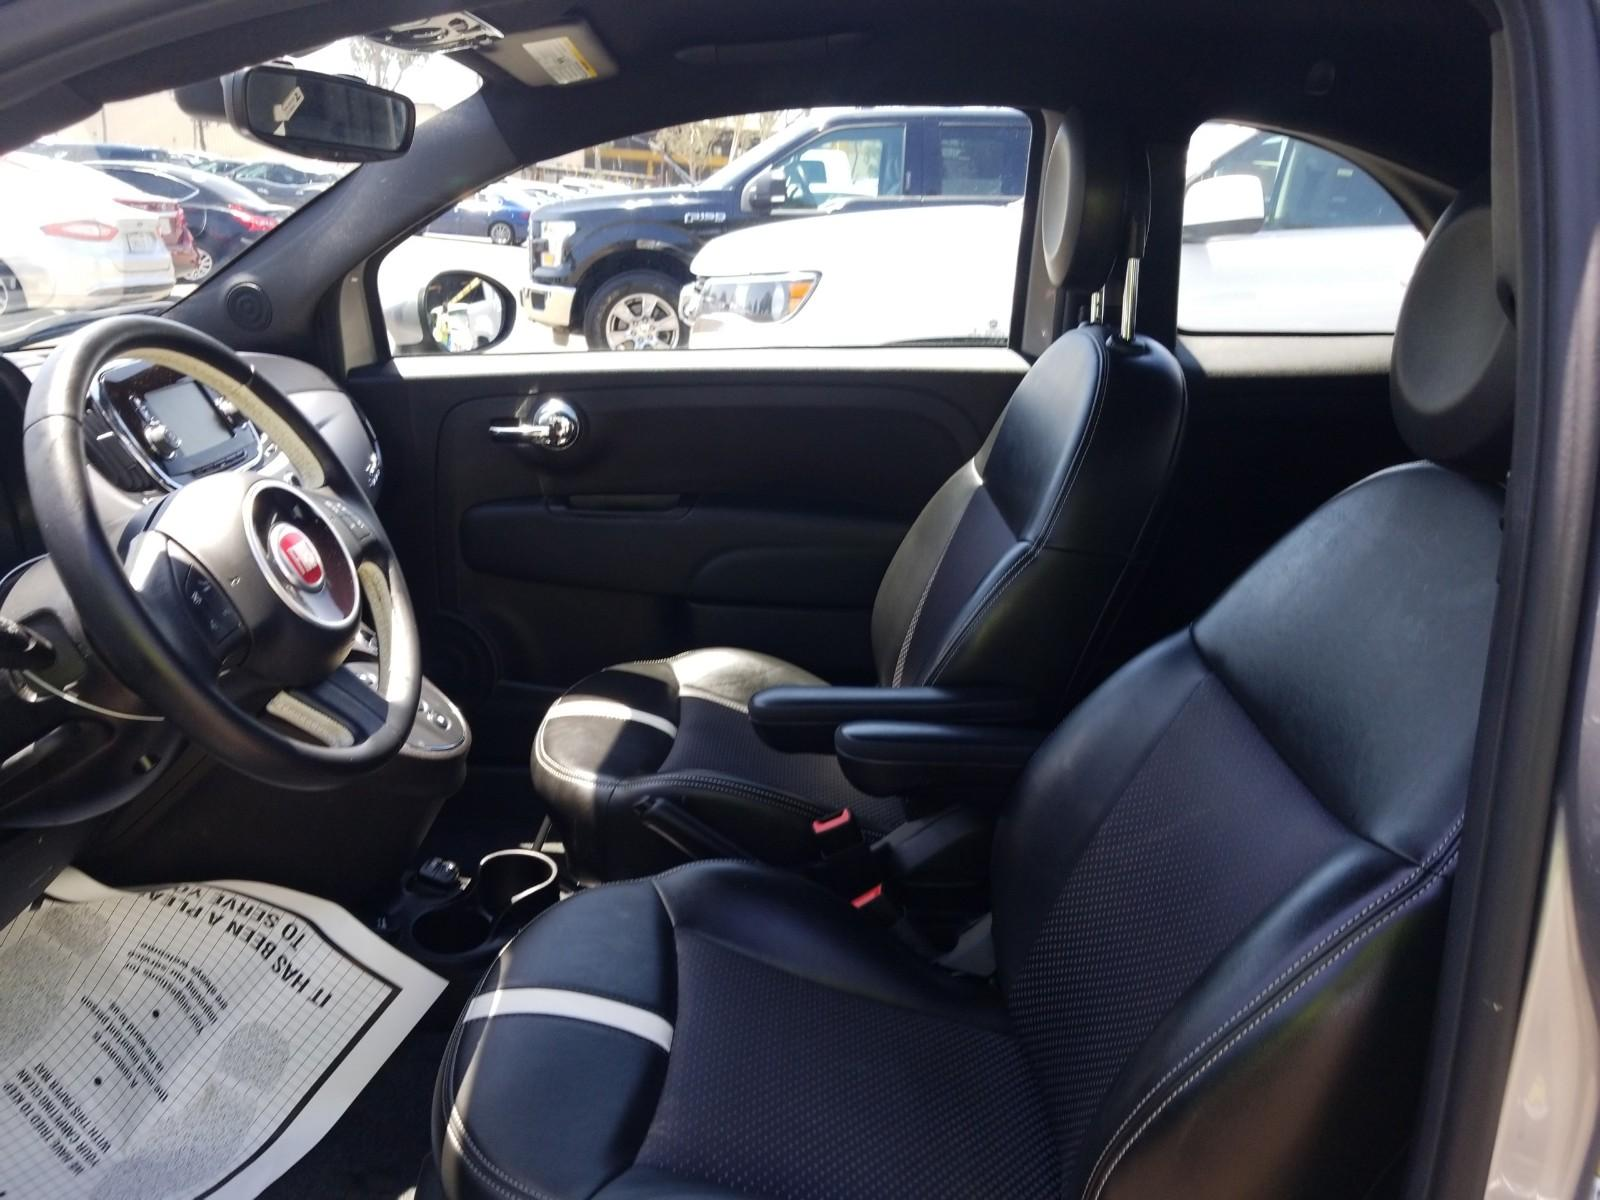 http://autocredit.com.ua/electro-cars/uploads/11/21-02-20/YINR4k_oQL5p0akGV.jpeg